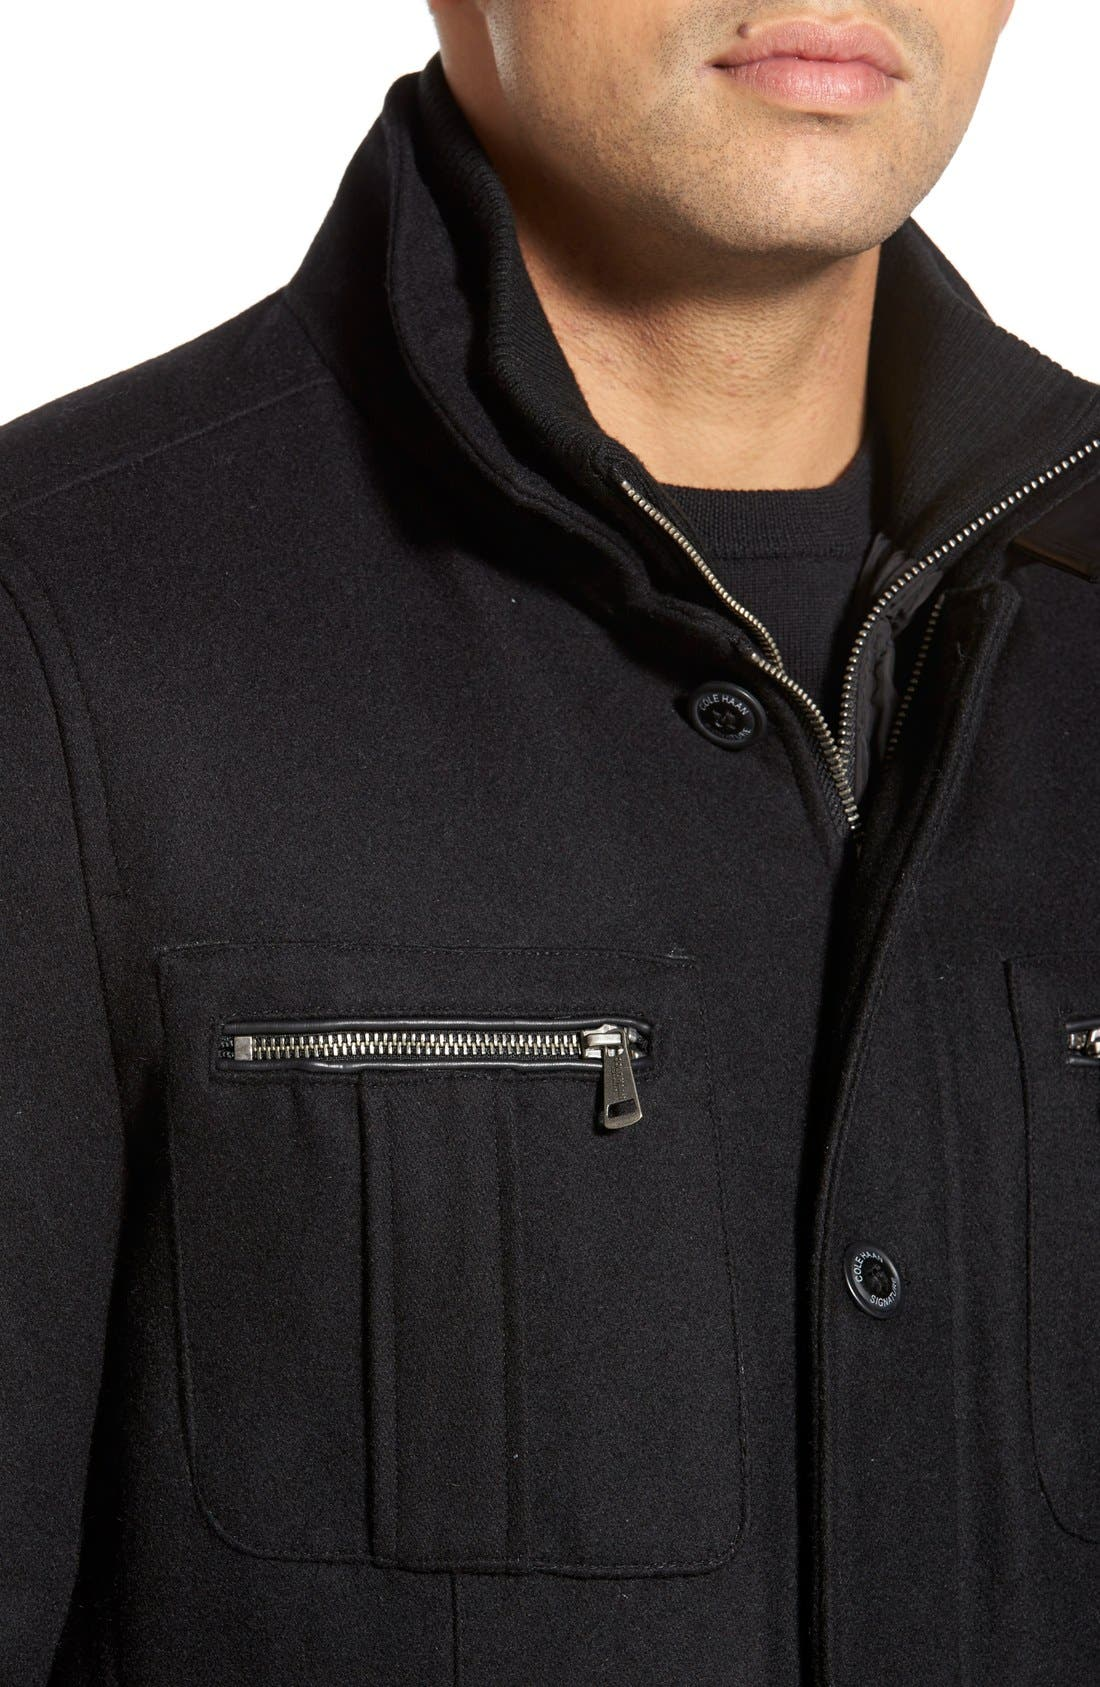 Wool Blend Jacket,                             Alternate thumbnail 3, color,                             Black